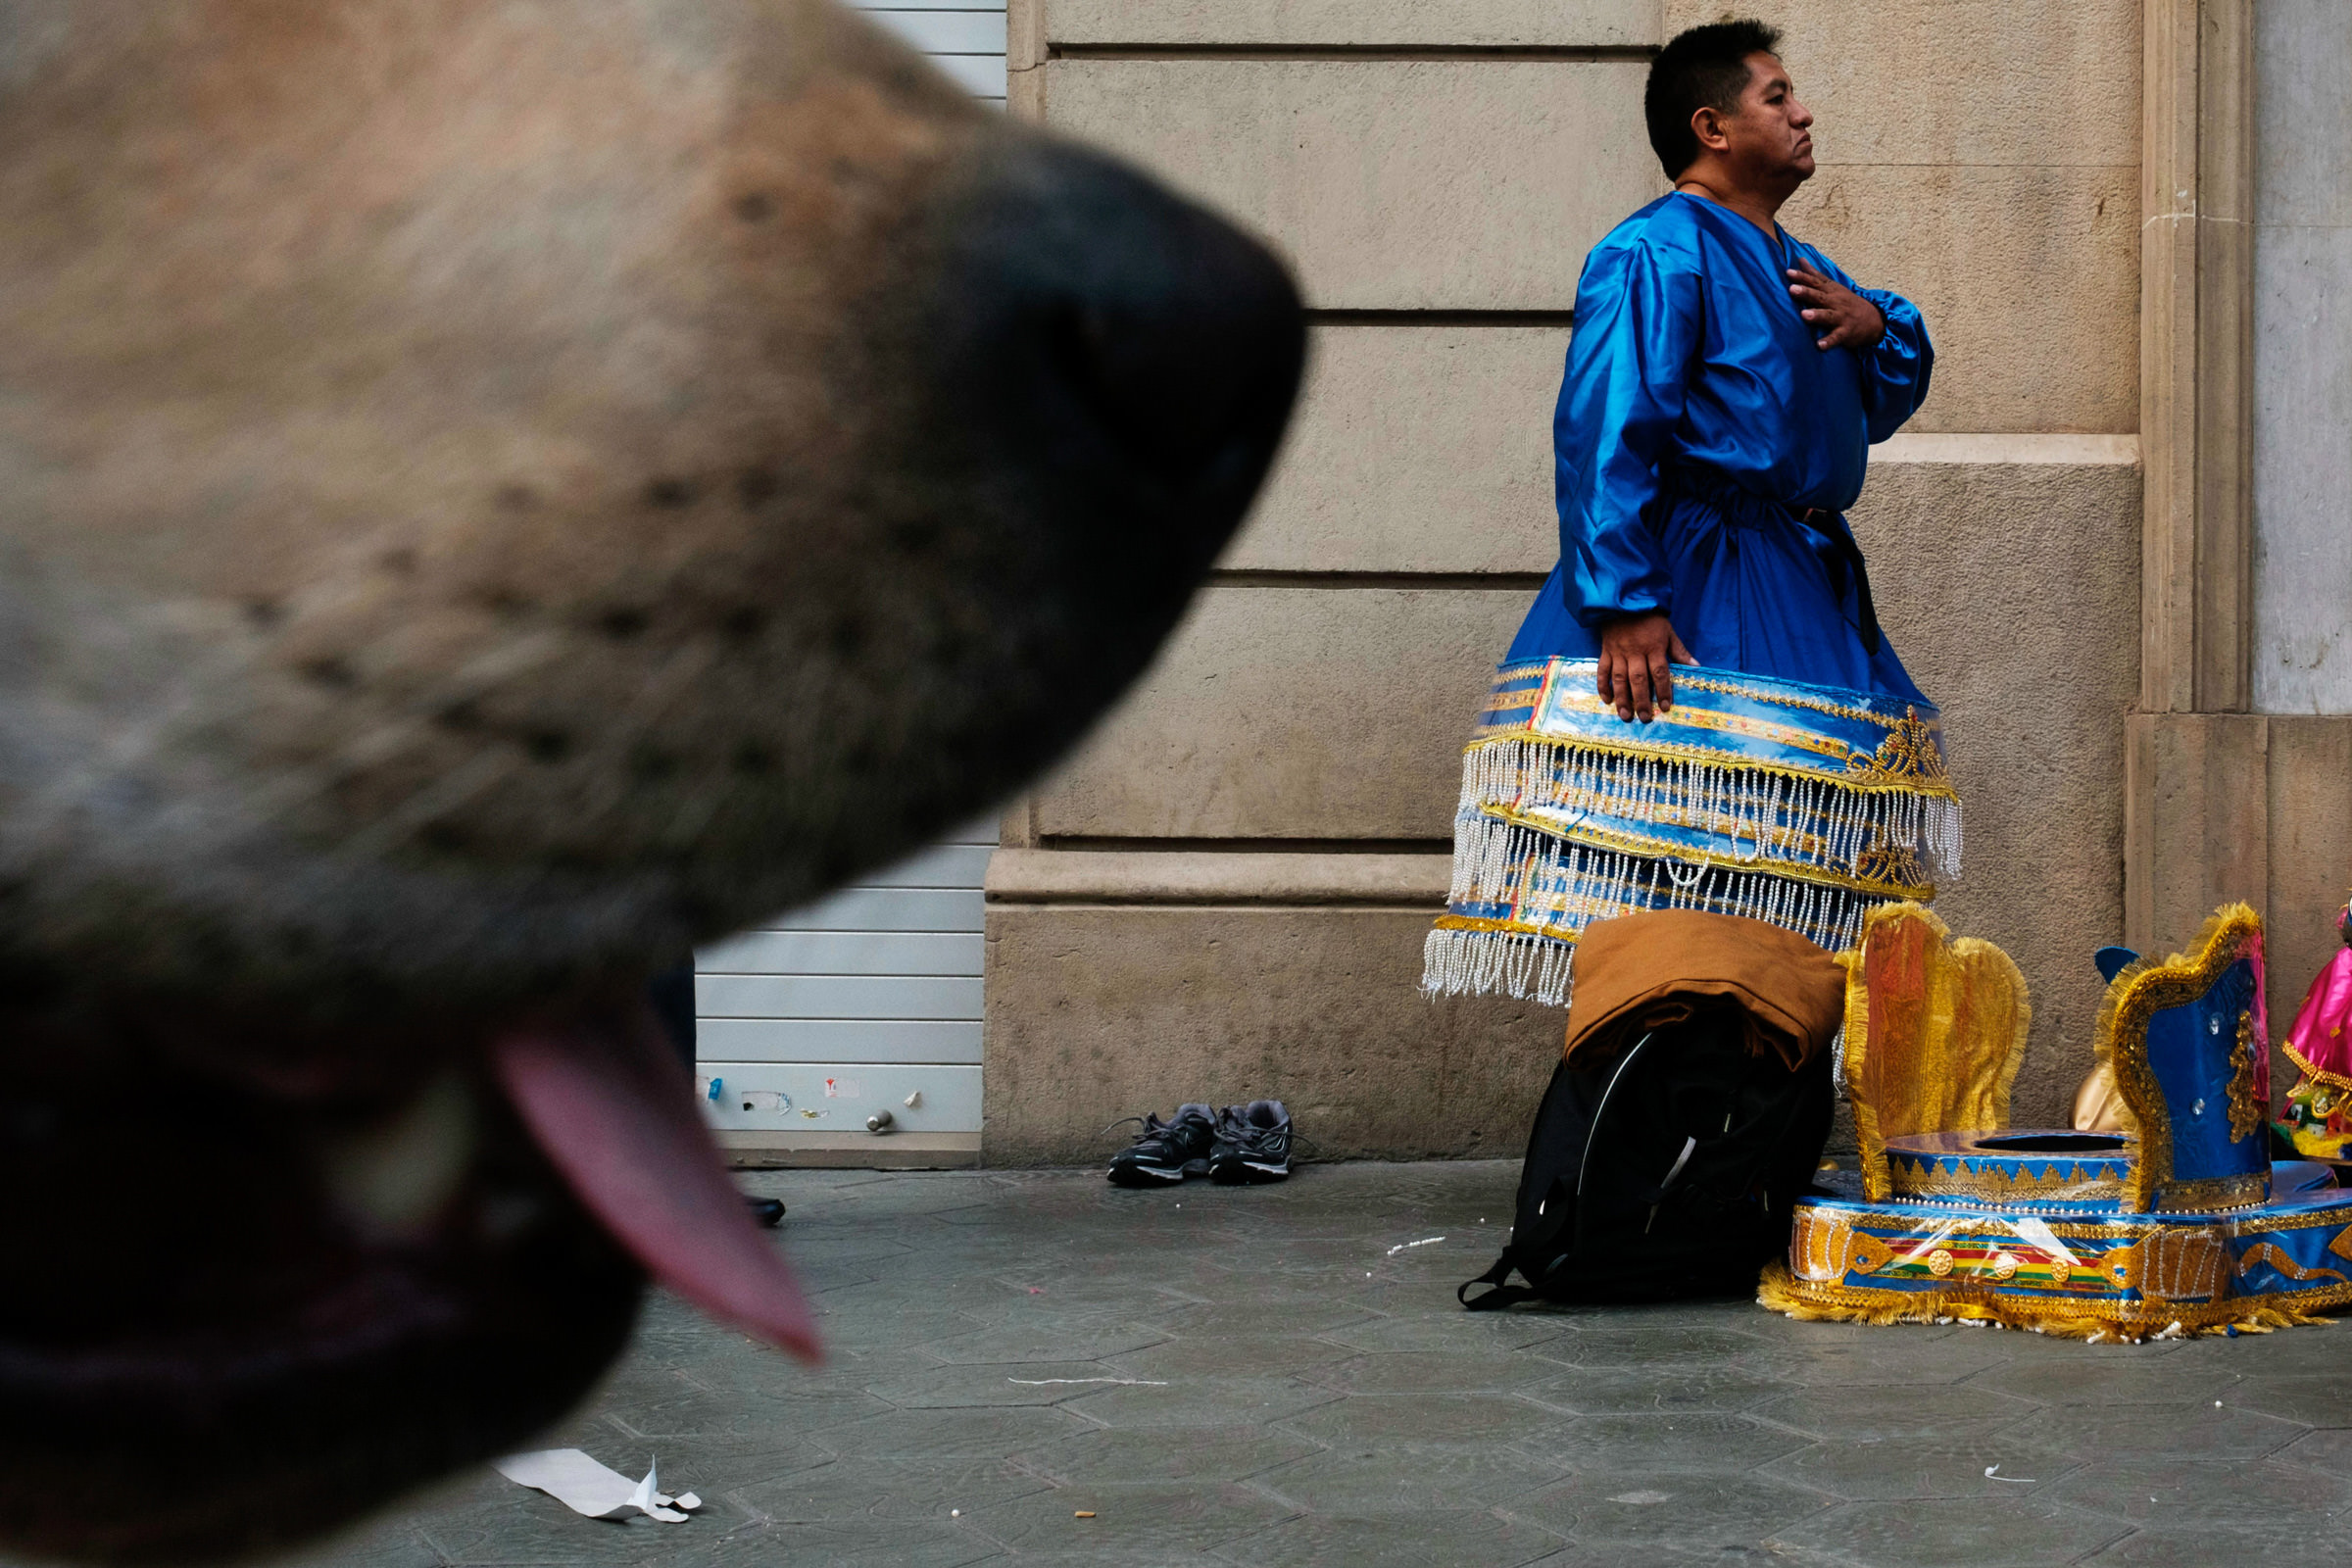 Spain-Street-Photography-2